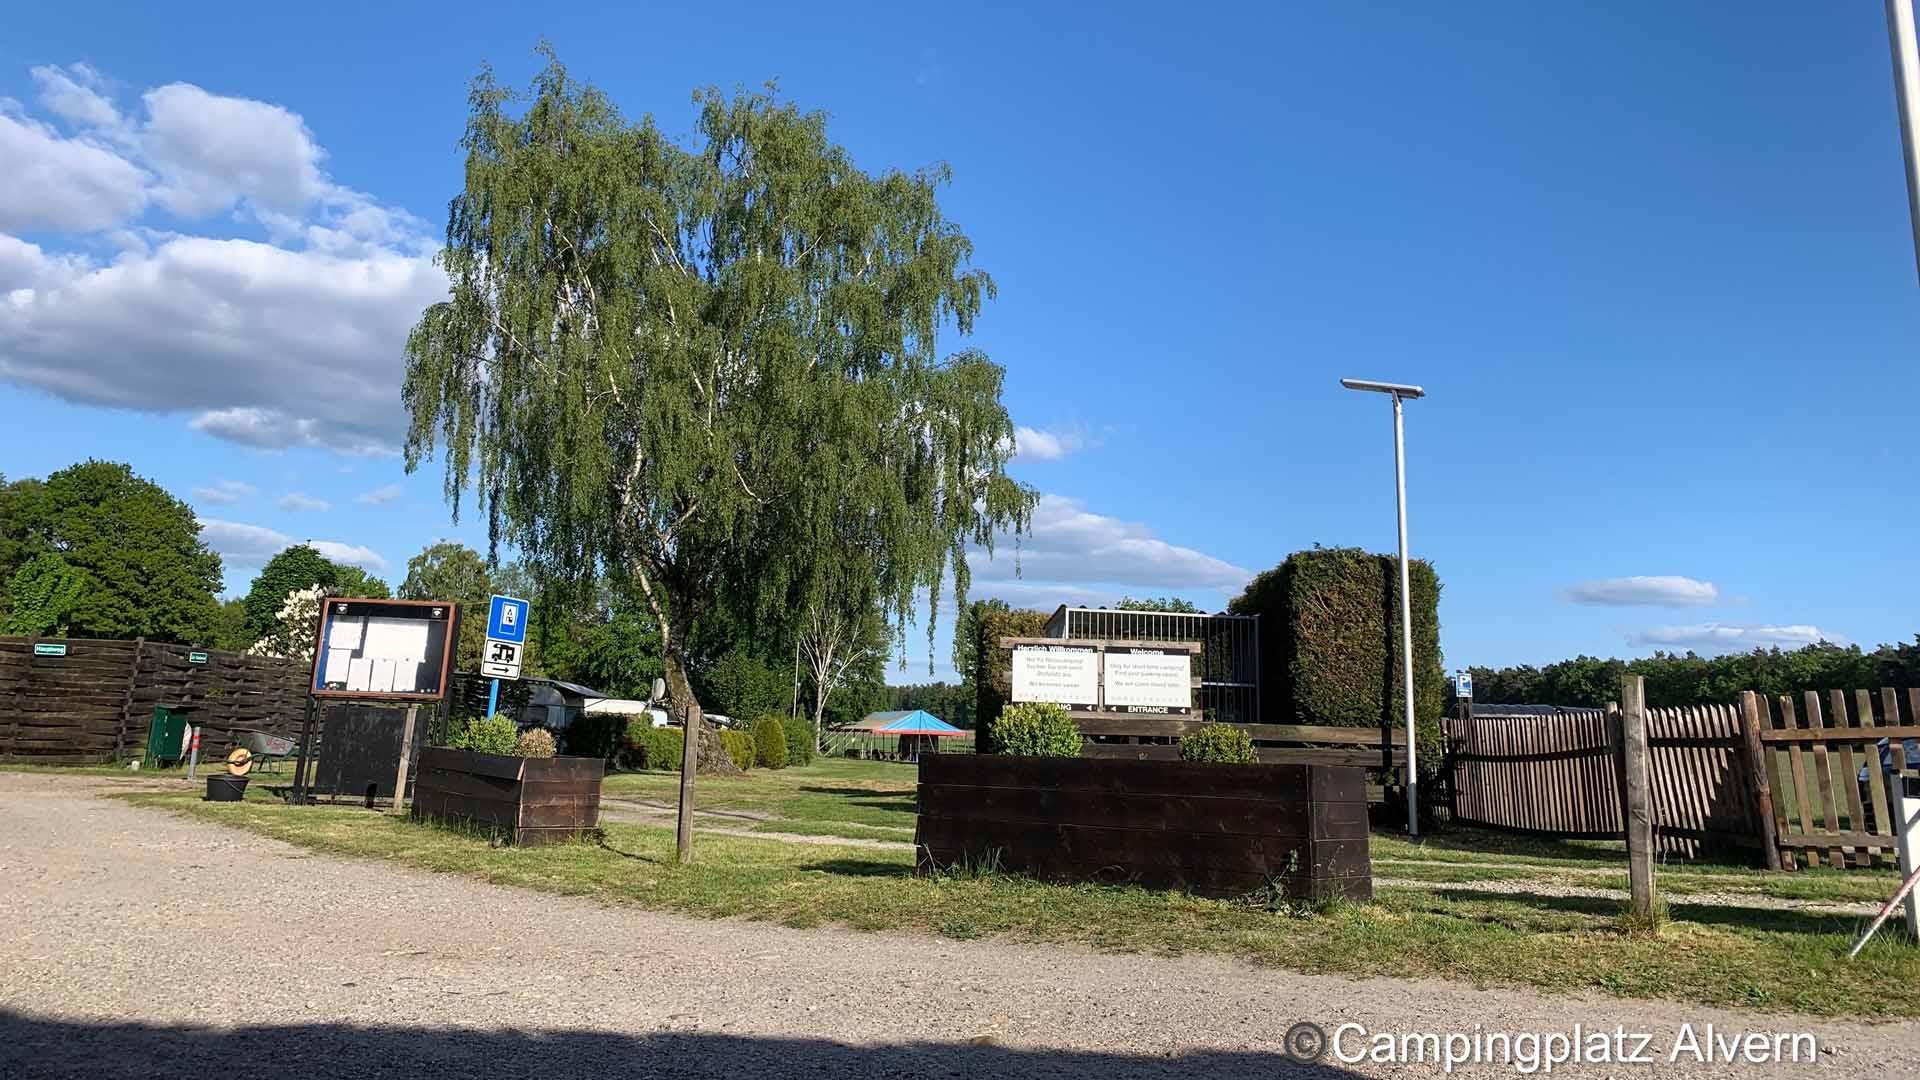 celle-campingplatz-alvern-eingang